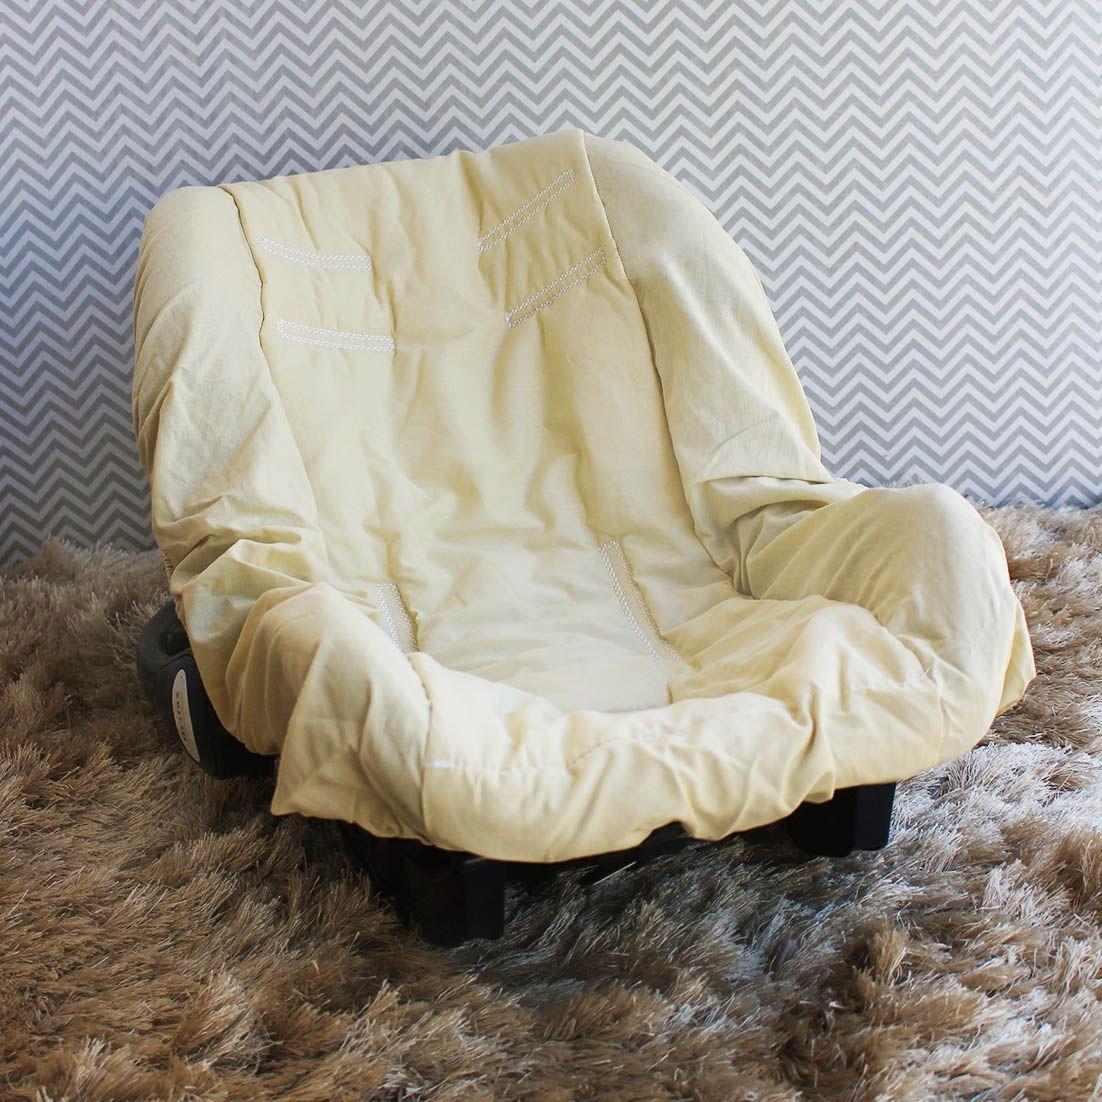 Capa de Bebê Conforto Adapt - Caqui c/ Branco